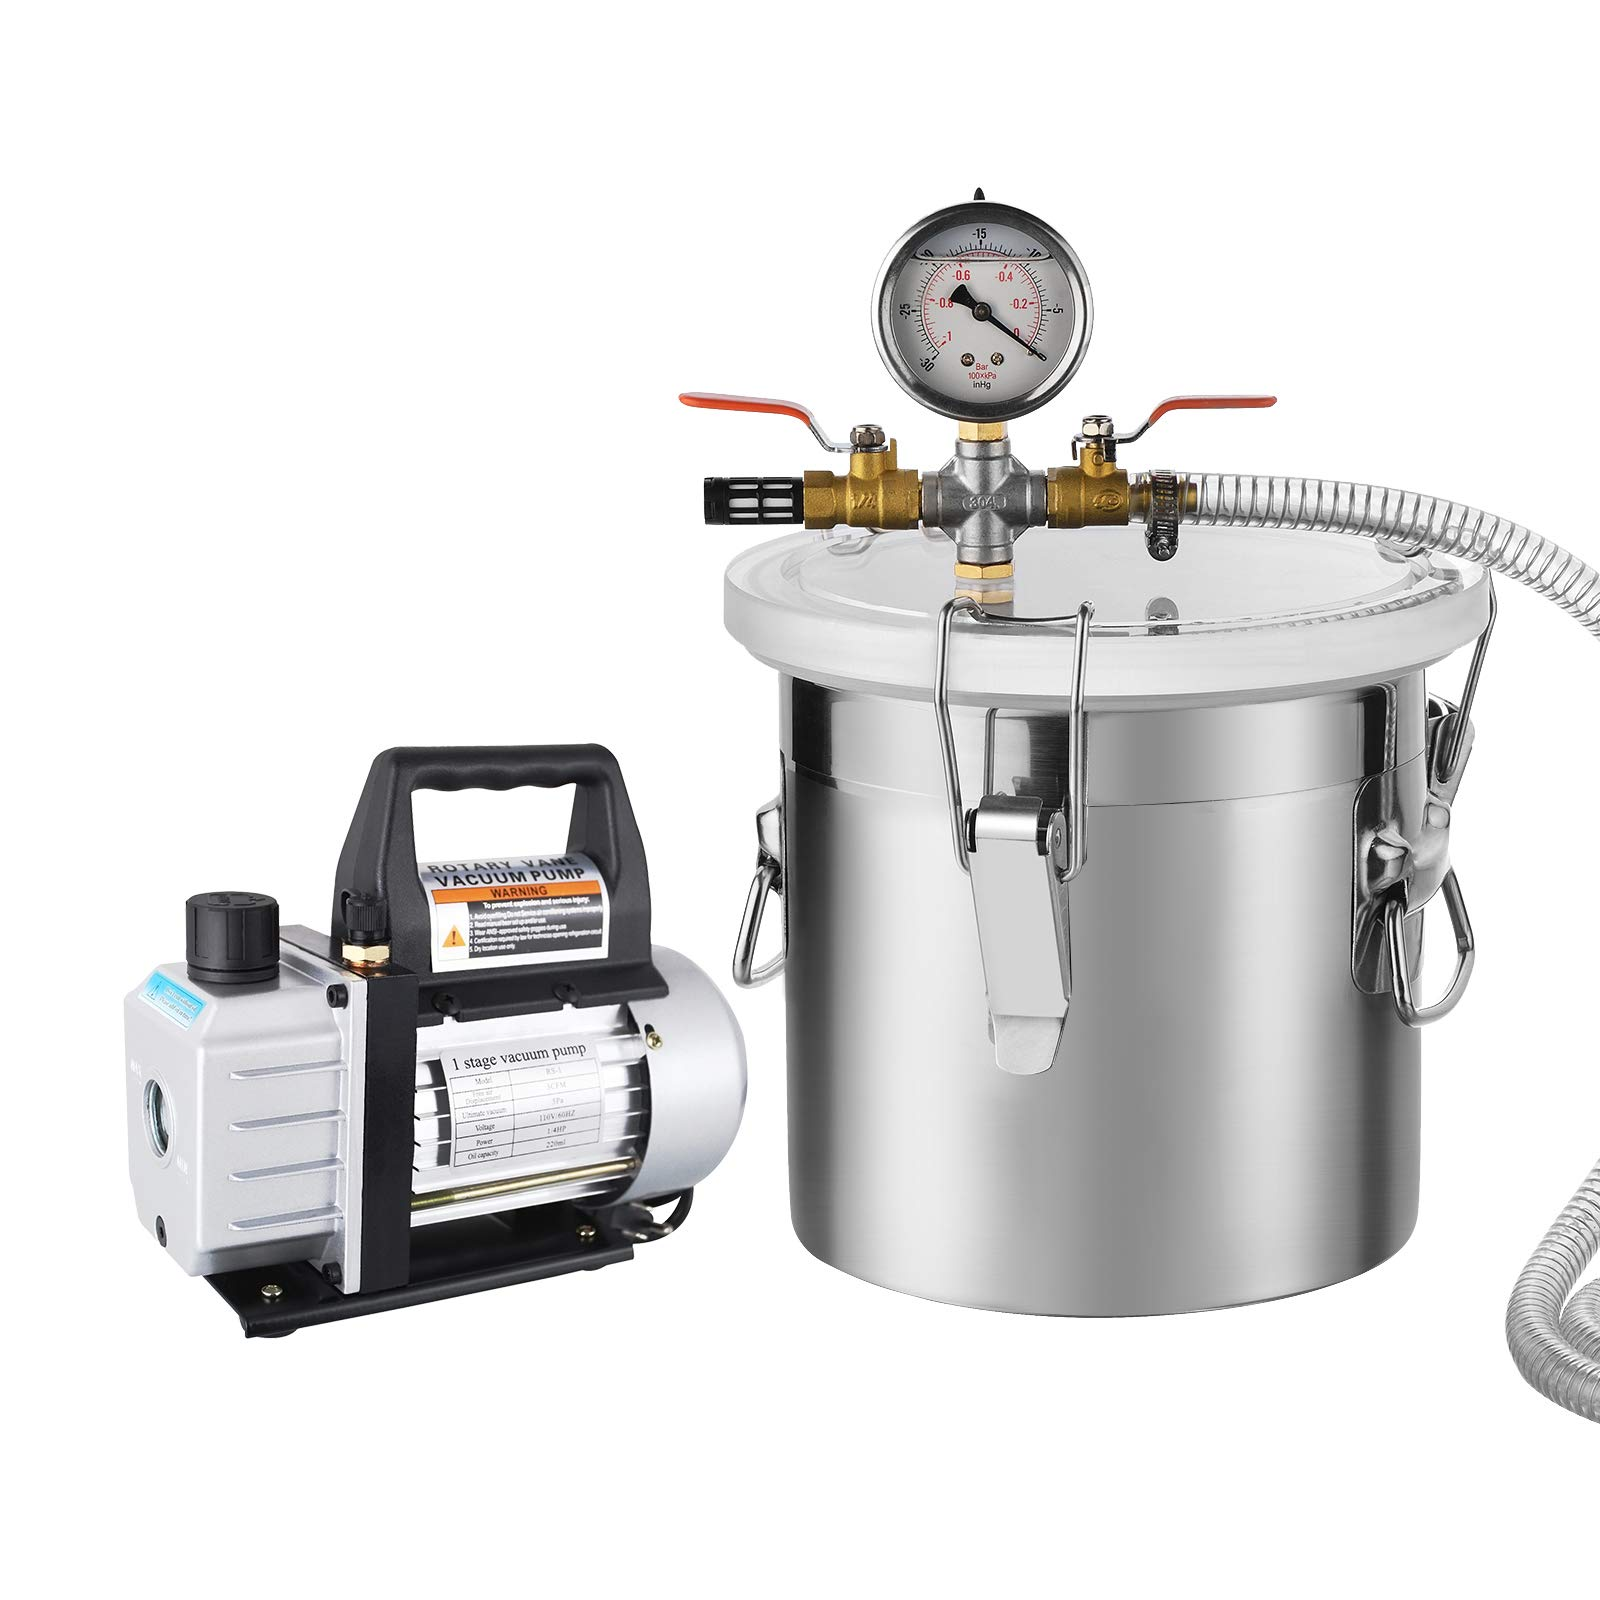 SUNCOO Vacuum Pump Kit,2 Gallon Vacuum Chamber with 5CFM Single Stage Vacuum Pump, Black by SUNCOO